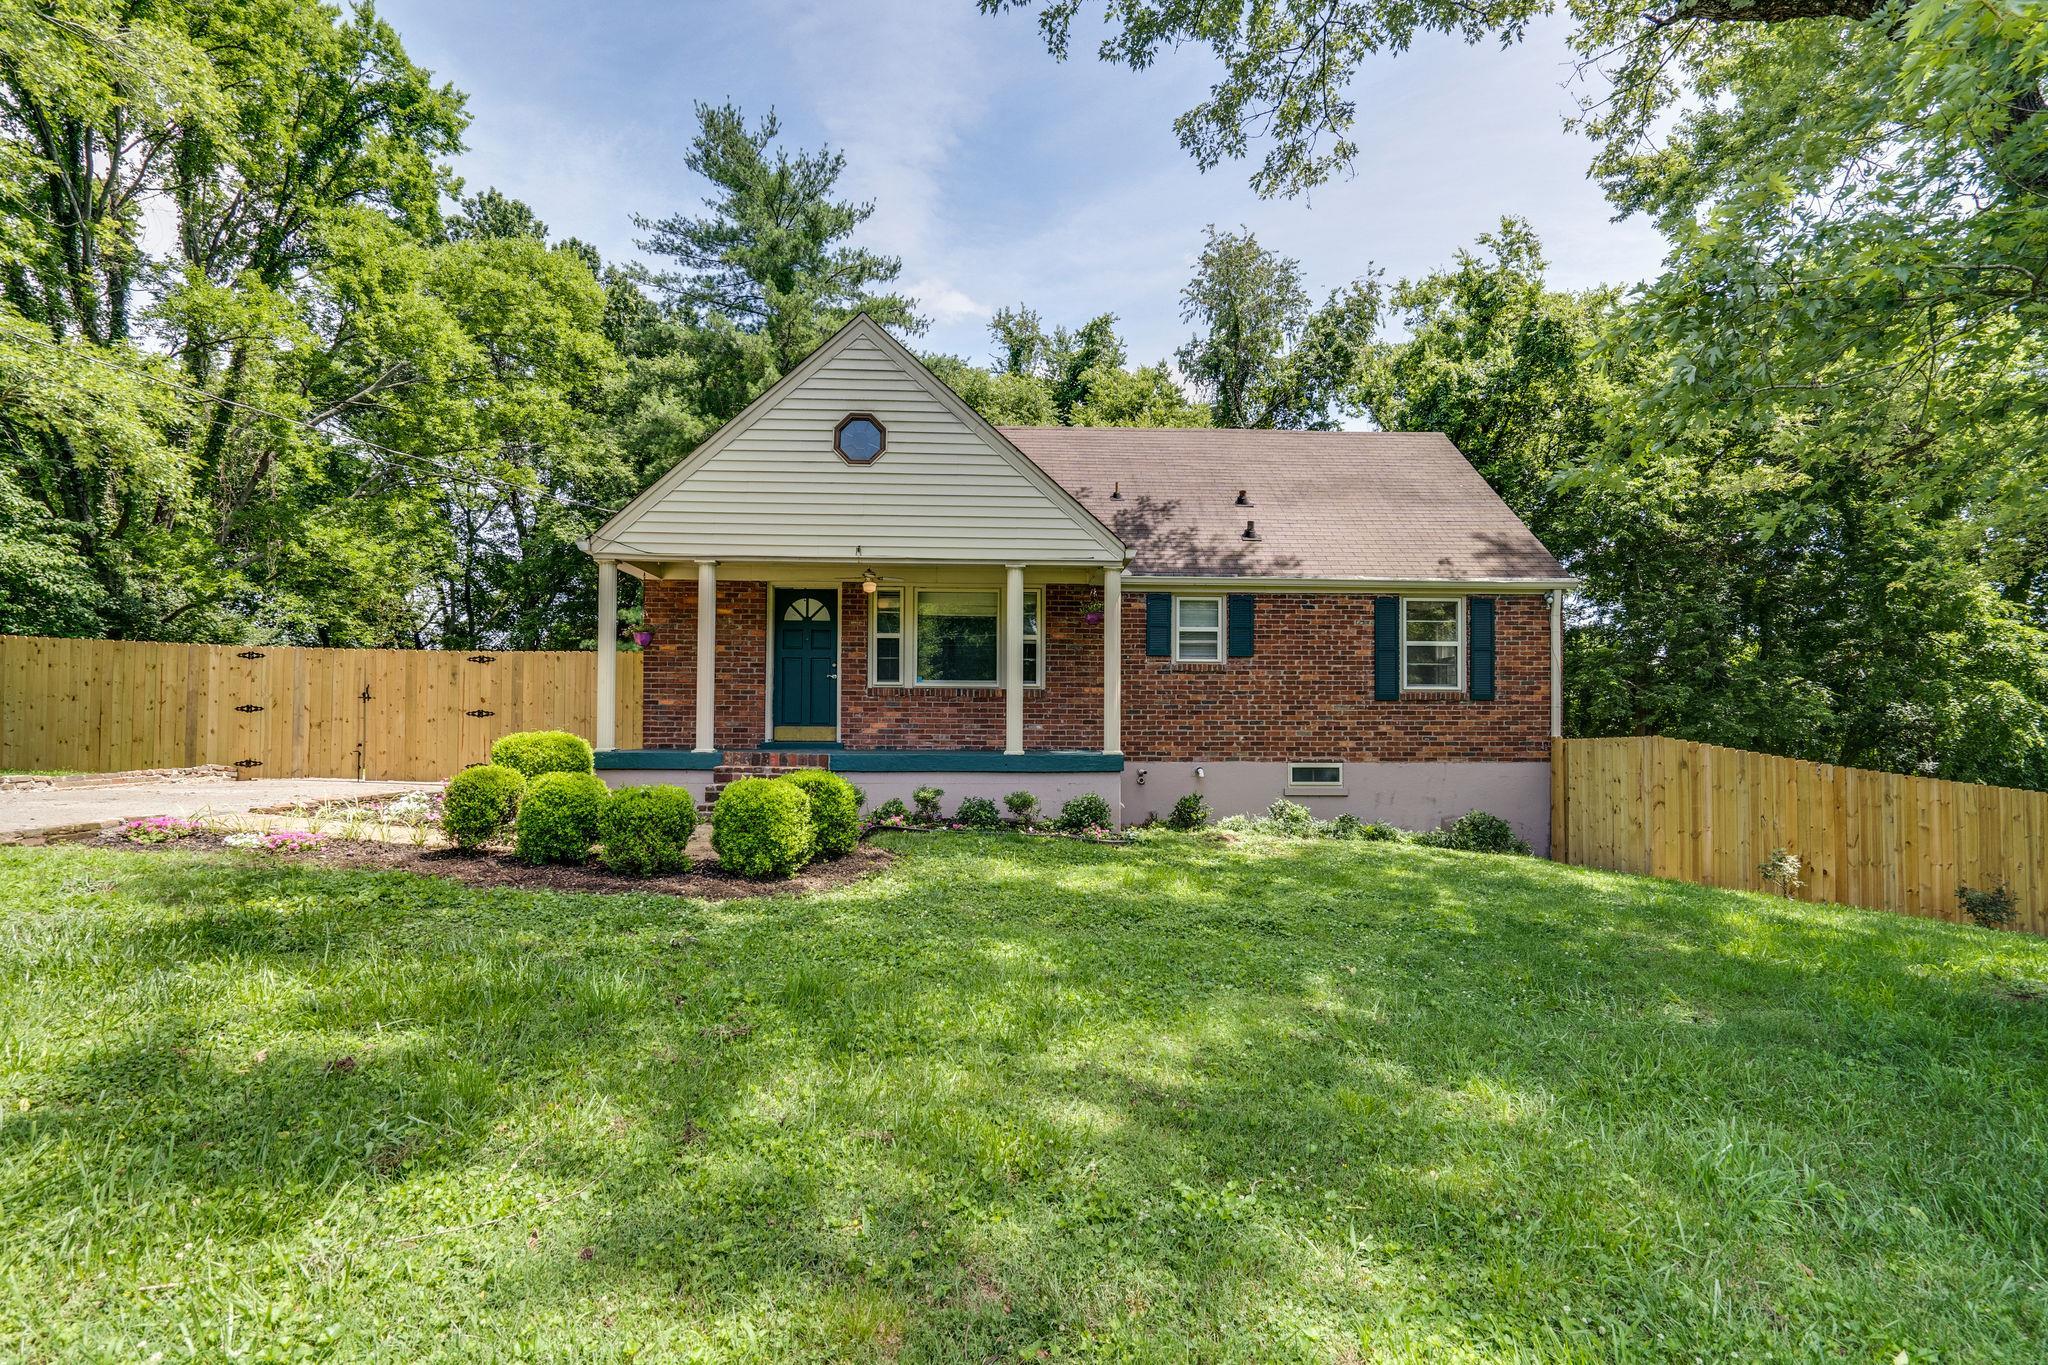 206 Quinn Ct, Nashville, TN 37210 - Nashville, TN real estate listing